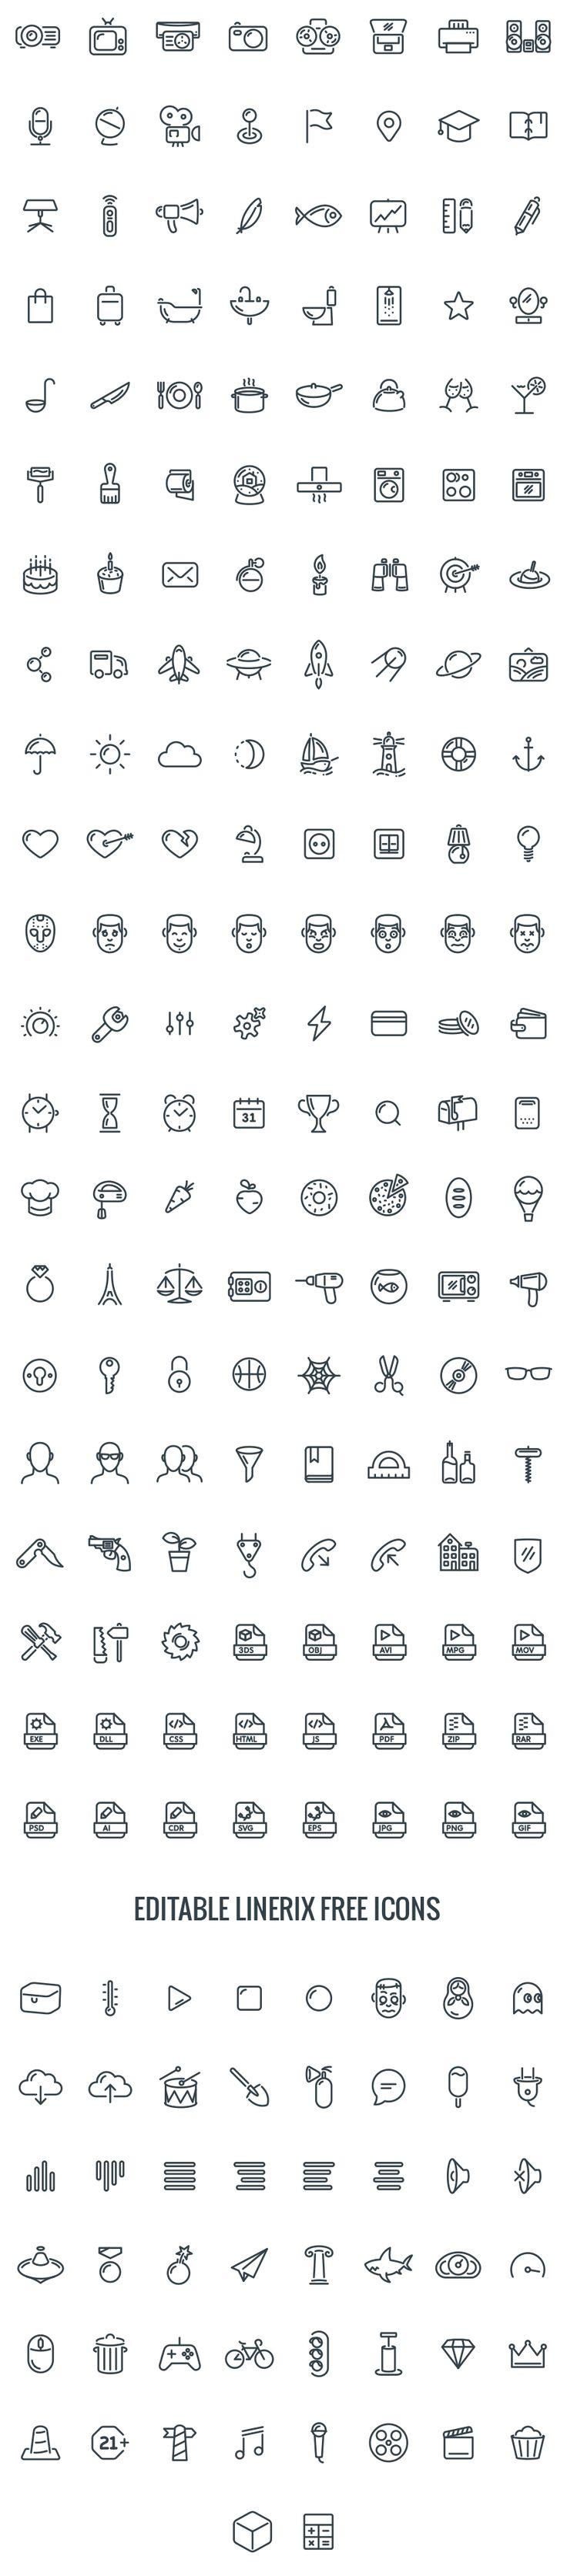 Linerix Icon set